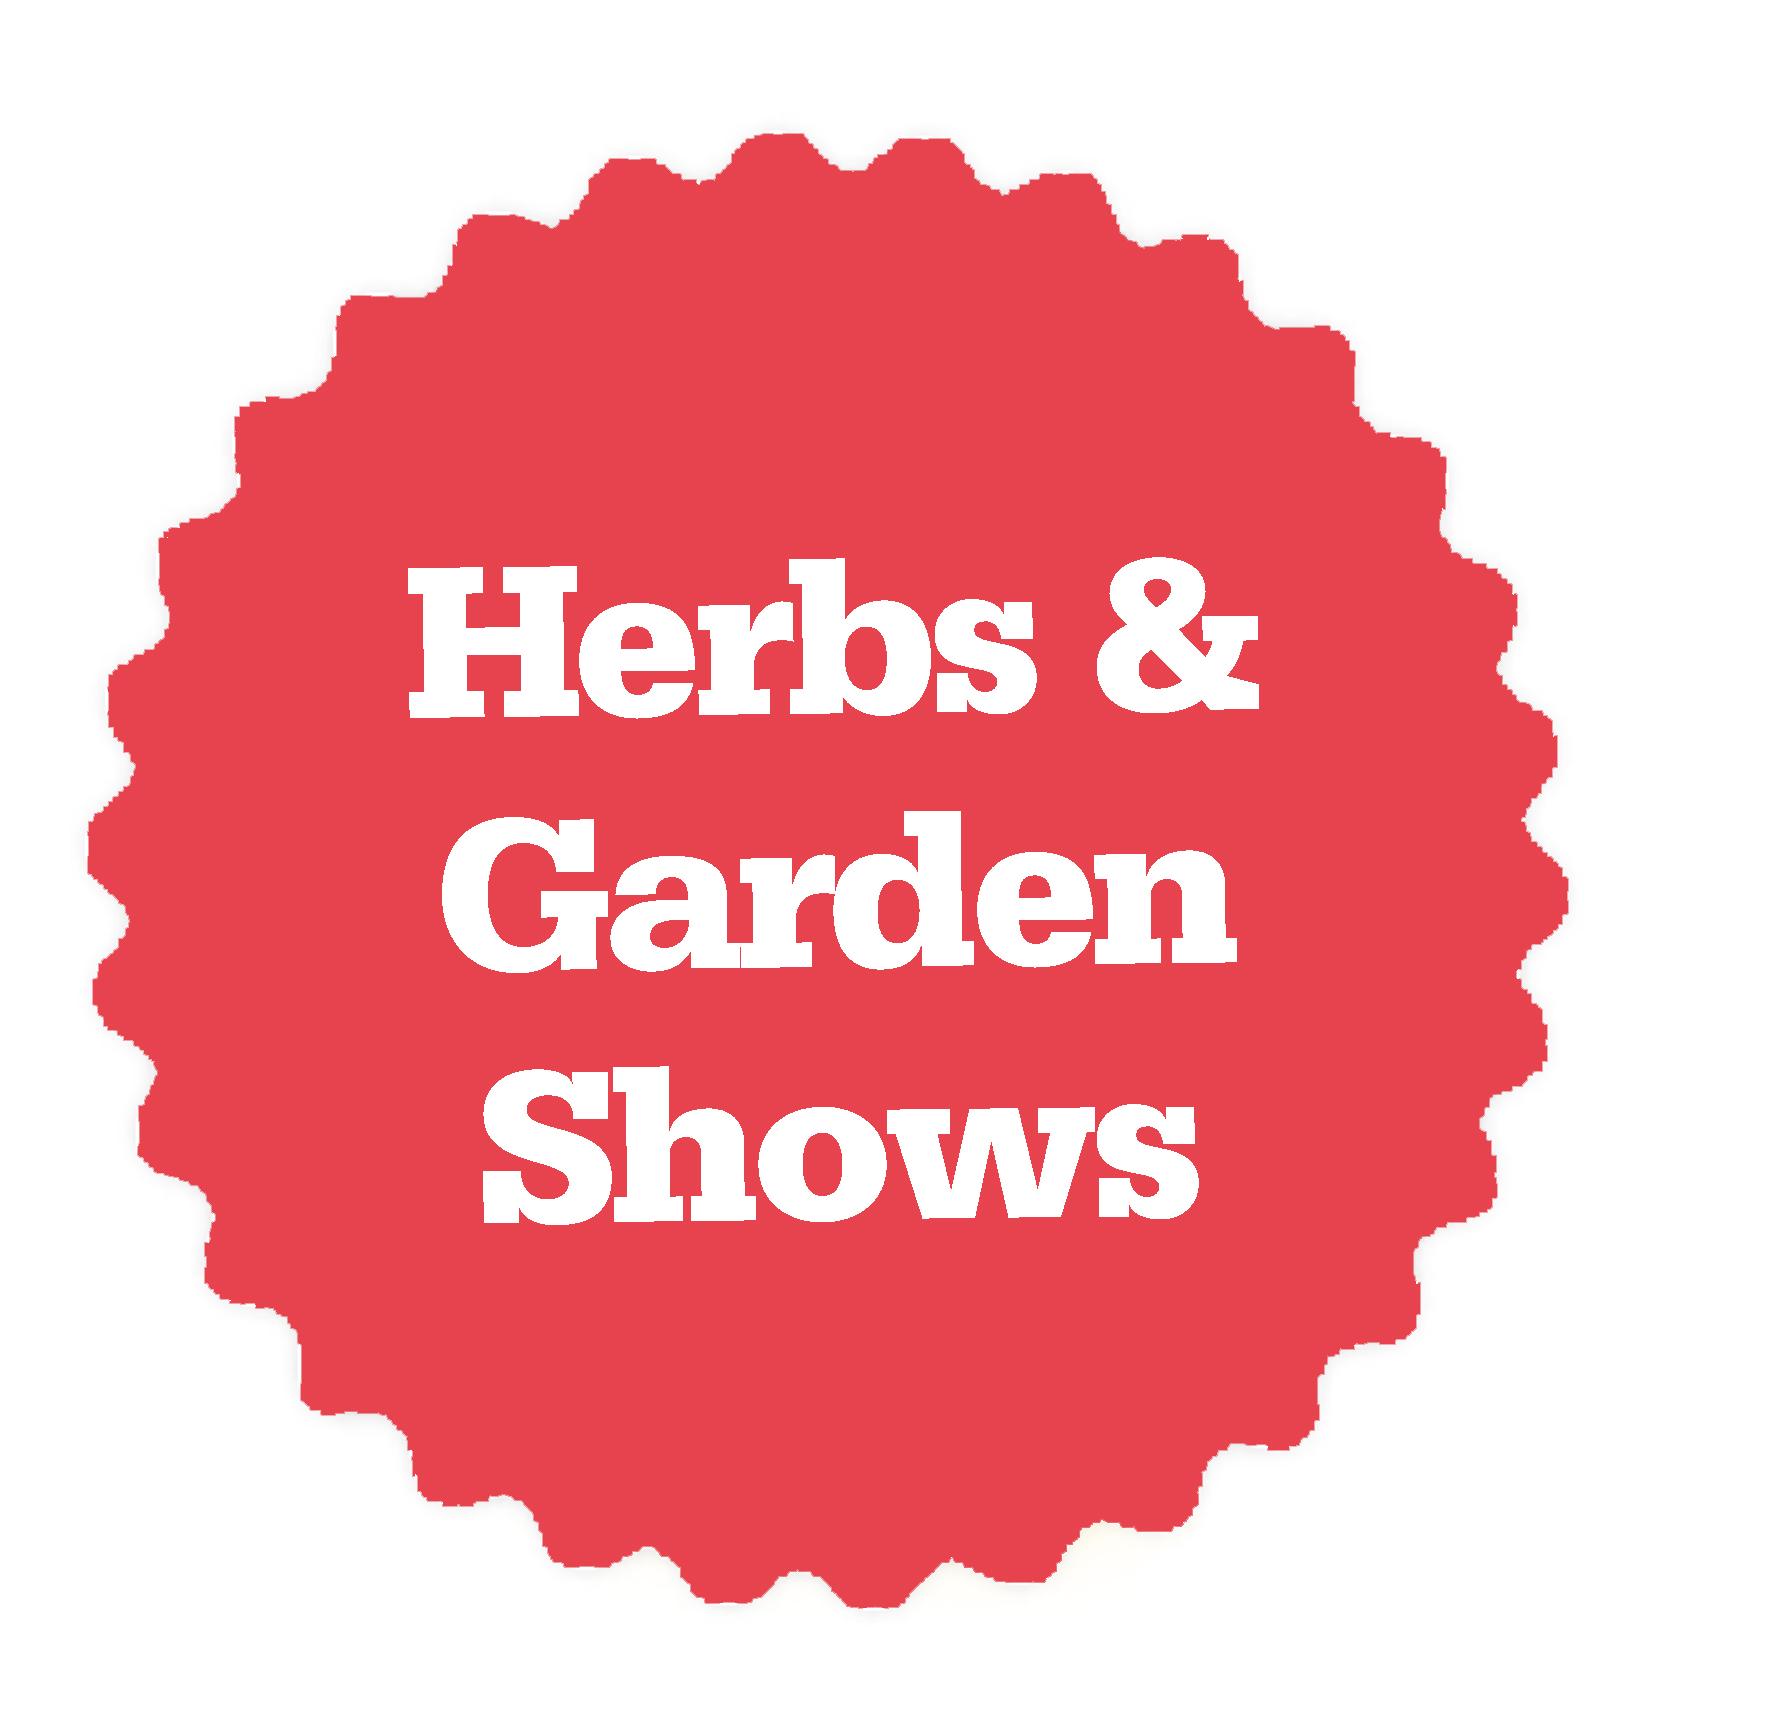 GFG Star_Herbs Garden Shows_rot